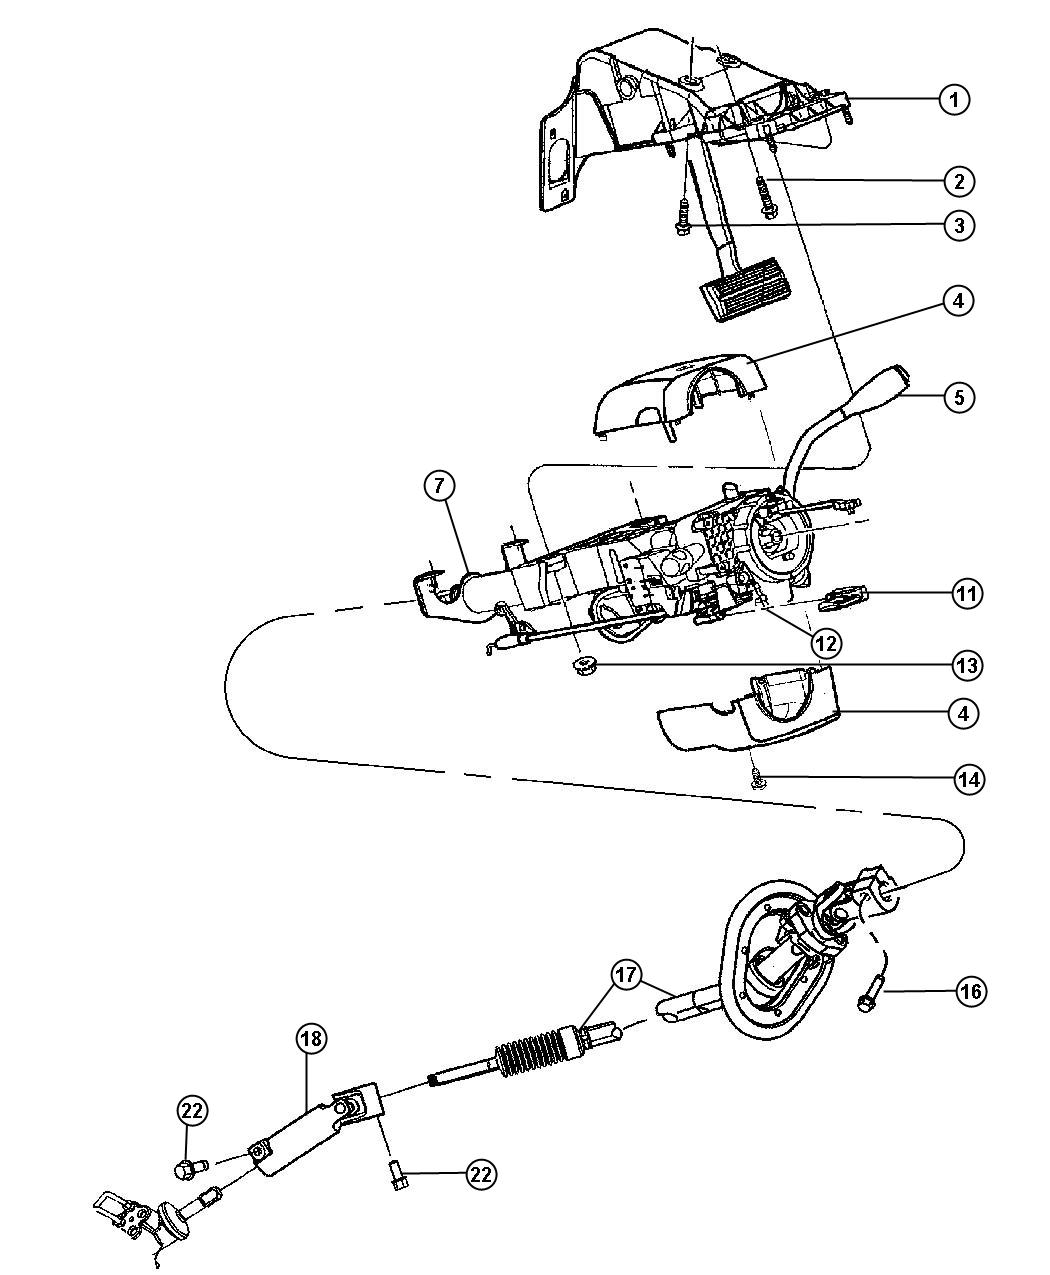 tags: #2005 dodge ram 1500 front suspension diagram#dodge ram 1500 steering  gear youtube#2010 dodge ram 1500 rear suspension#2002 dodge ram 1500  steering